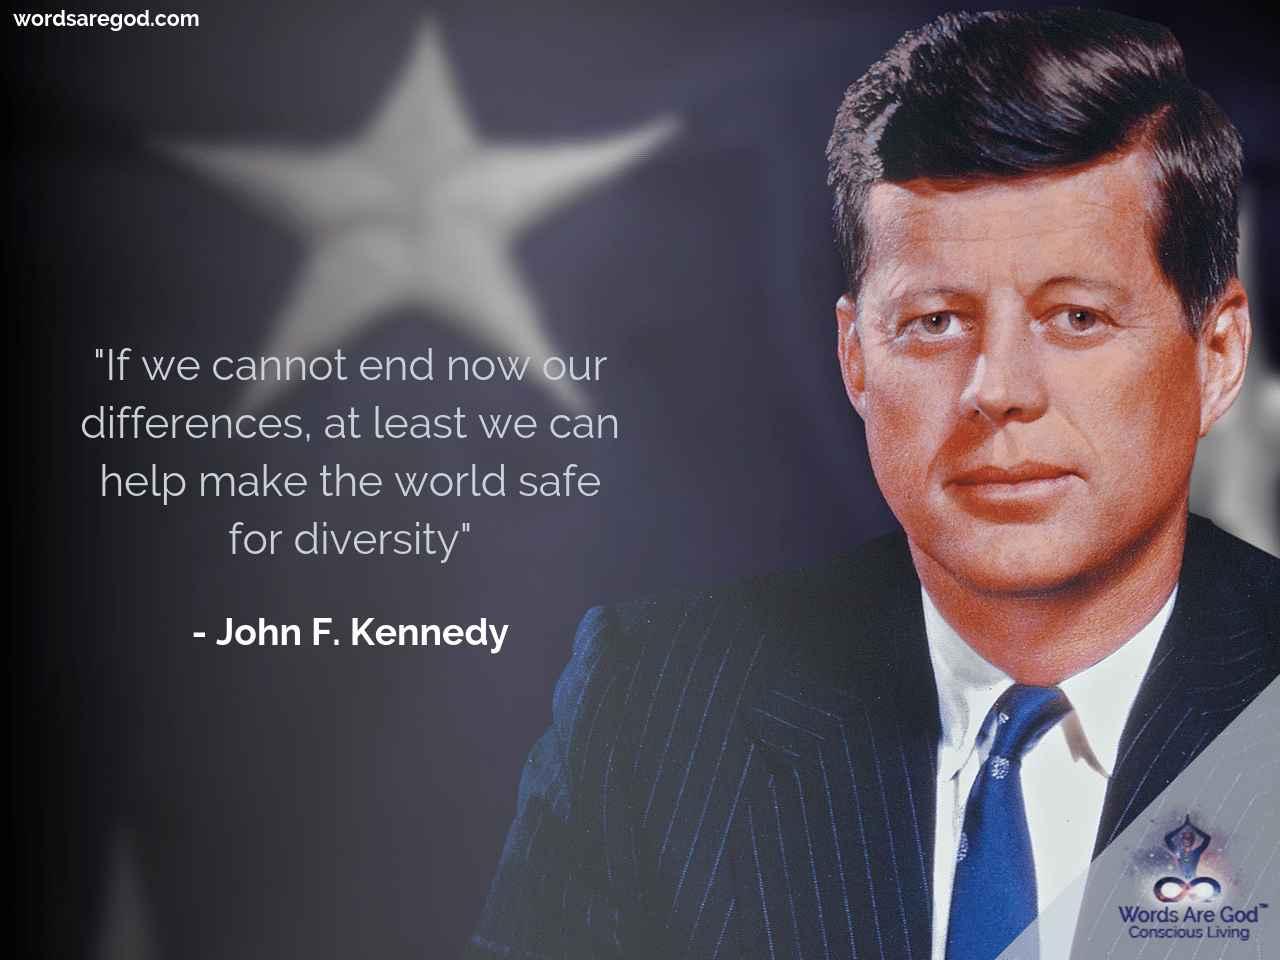 John F. Kennedy Motivational Quote by John F. Kennedy